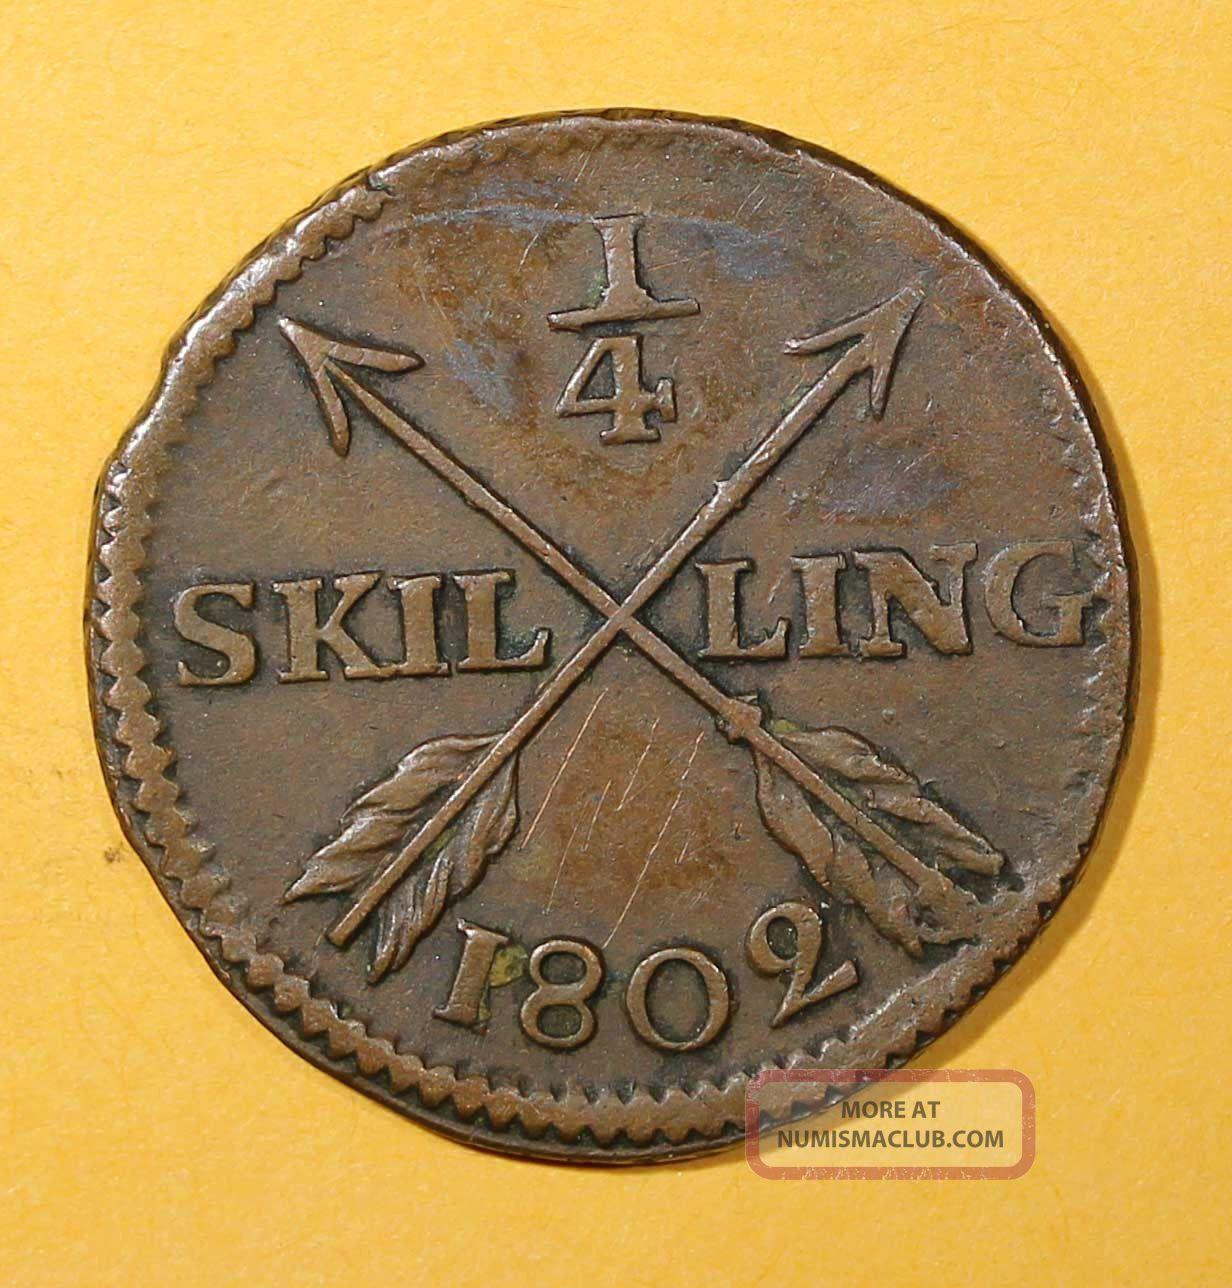 Sweden Copper King Gustav Iv Adolf 1802 1/4 Skilling Brown Km 564 Europe photo